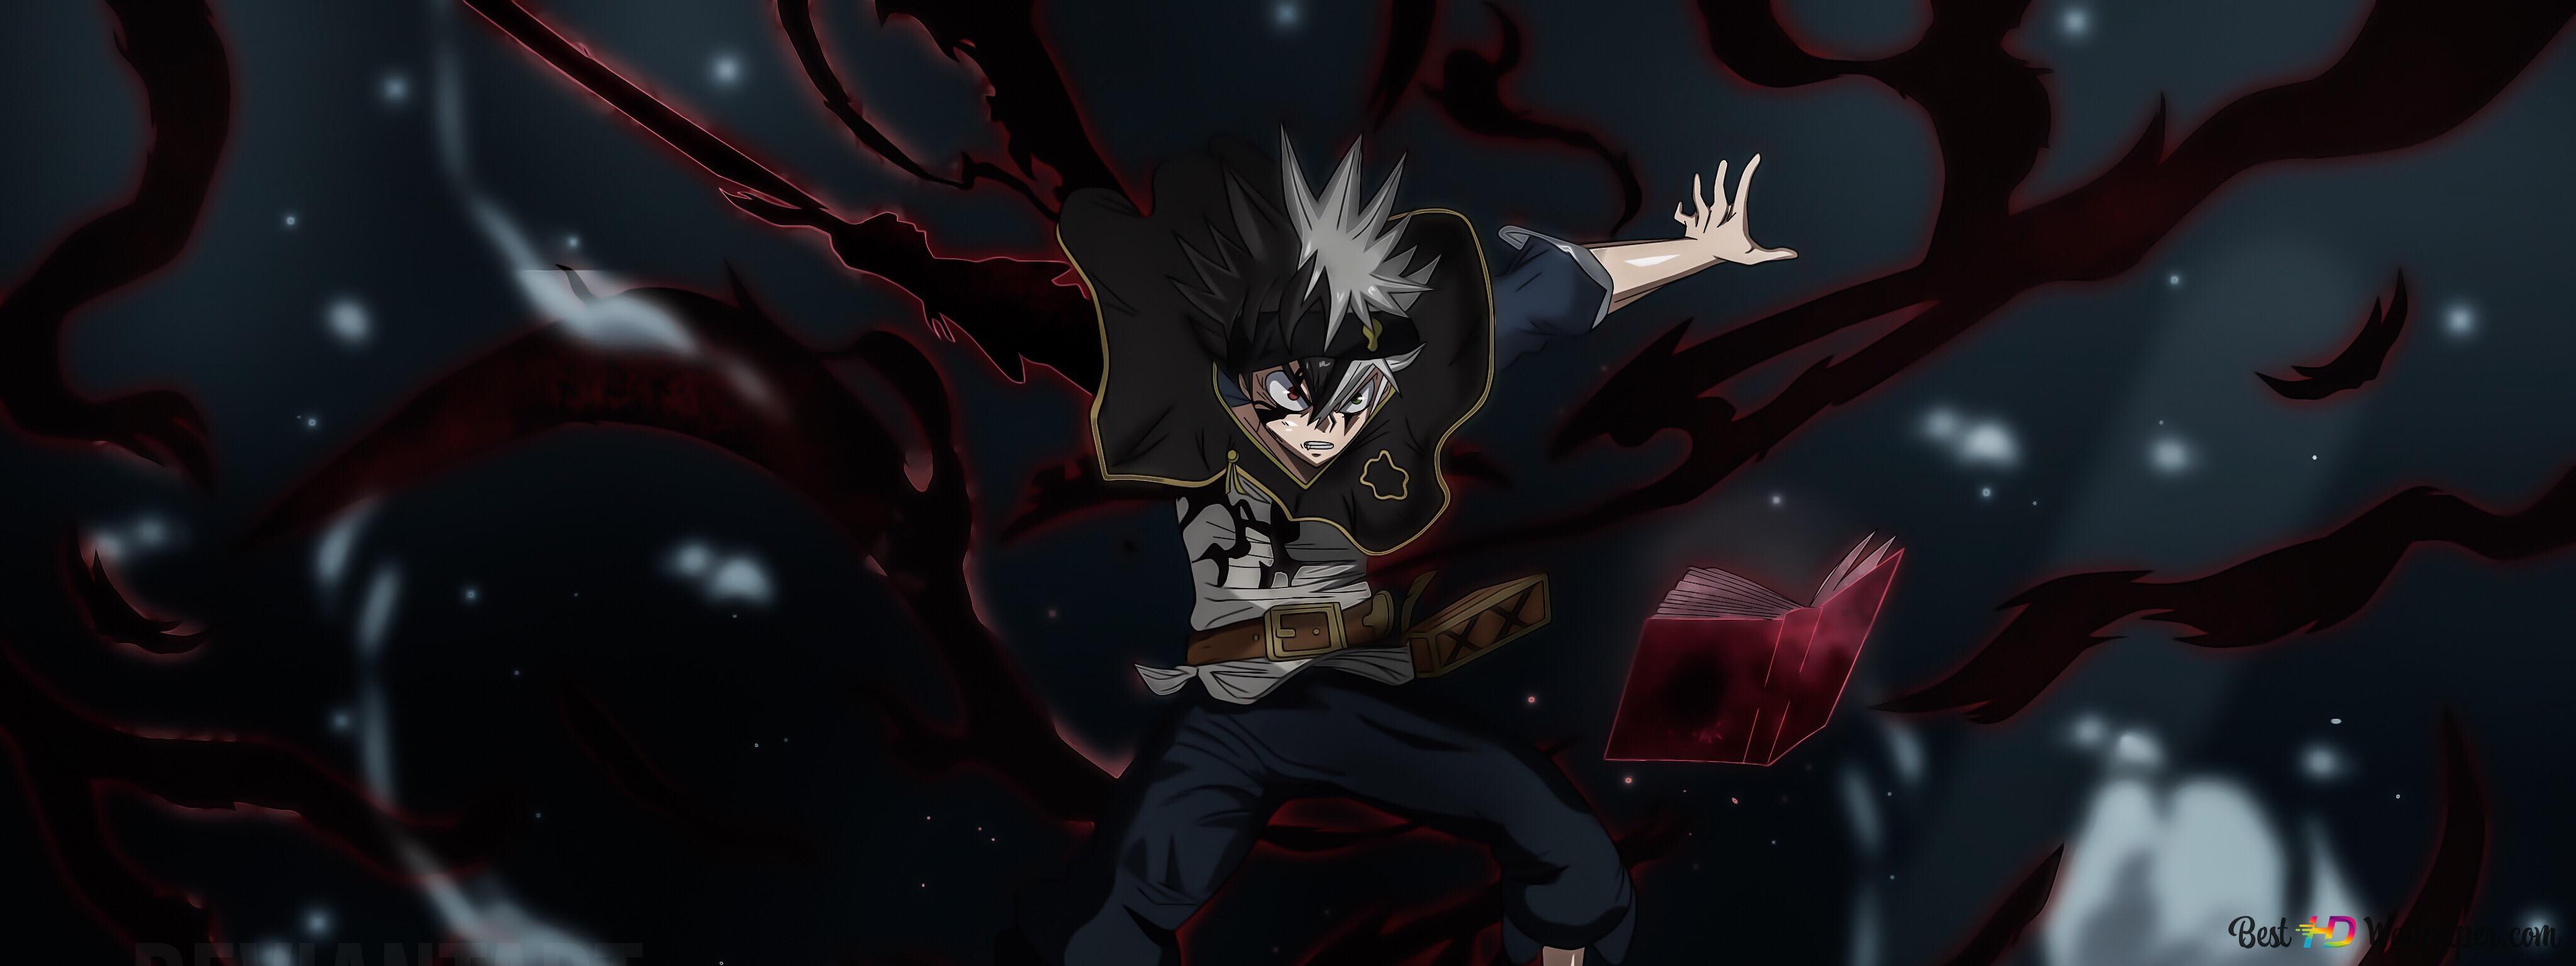 Dual Monitor Wallpaper Anime Hd